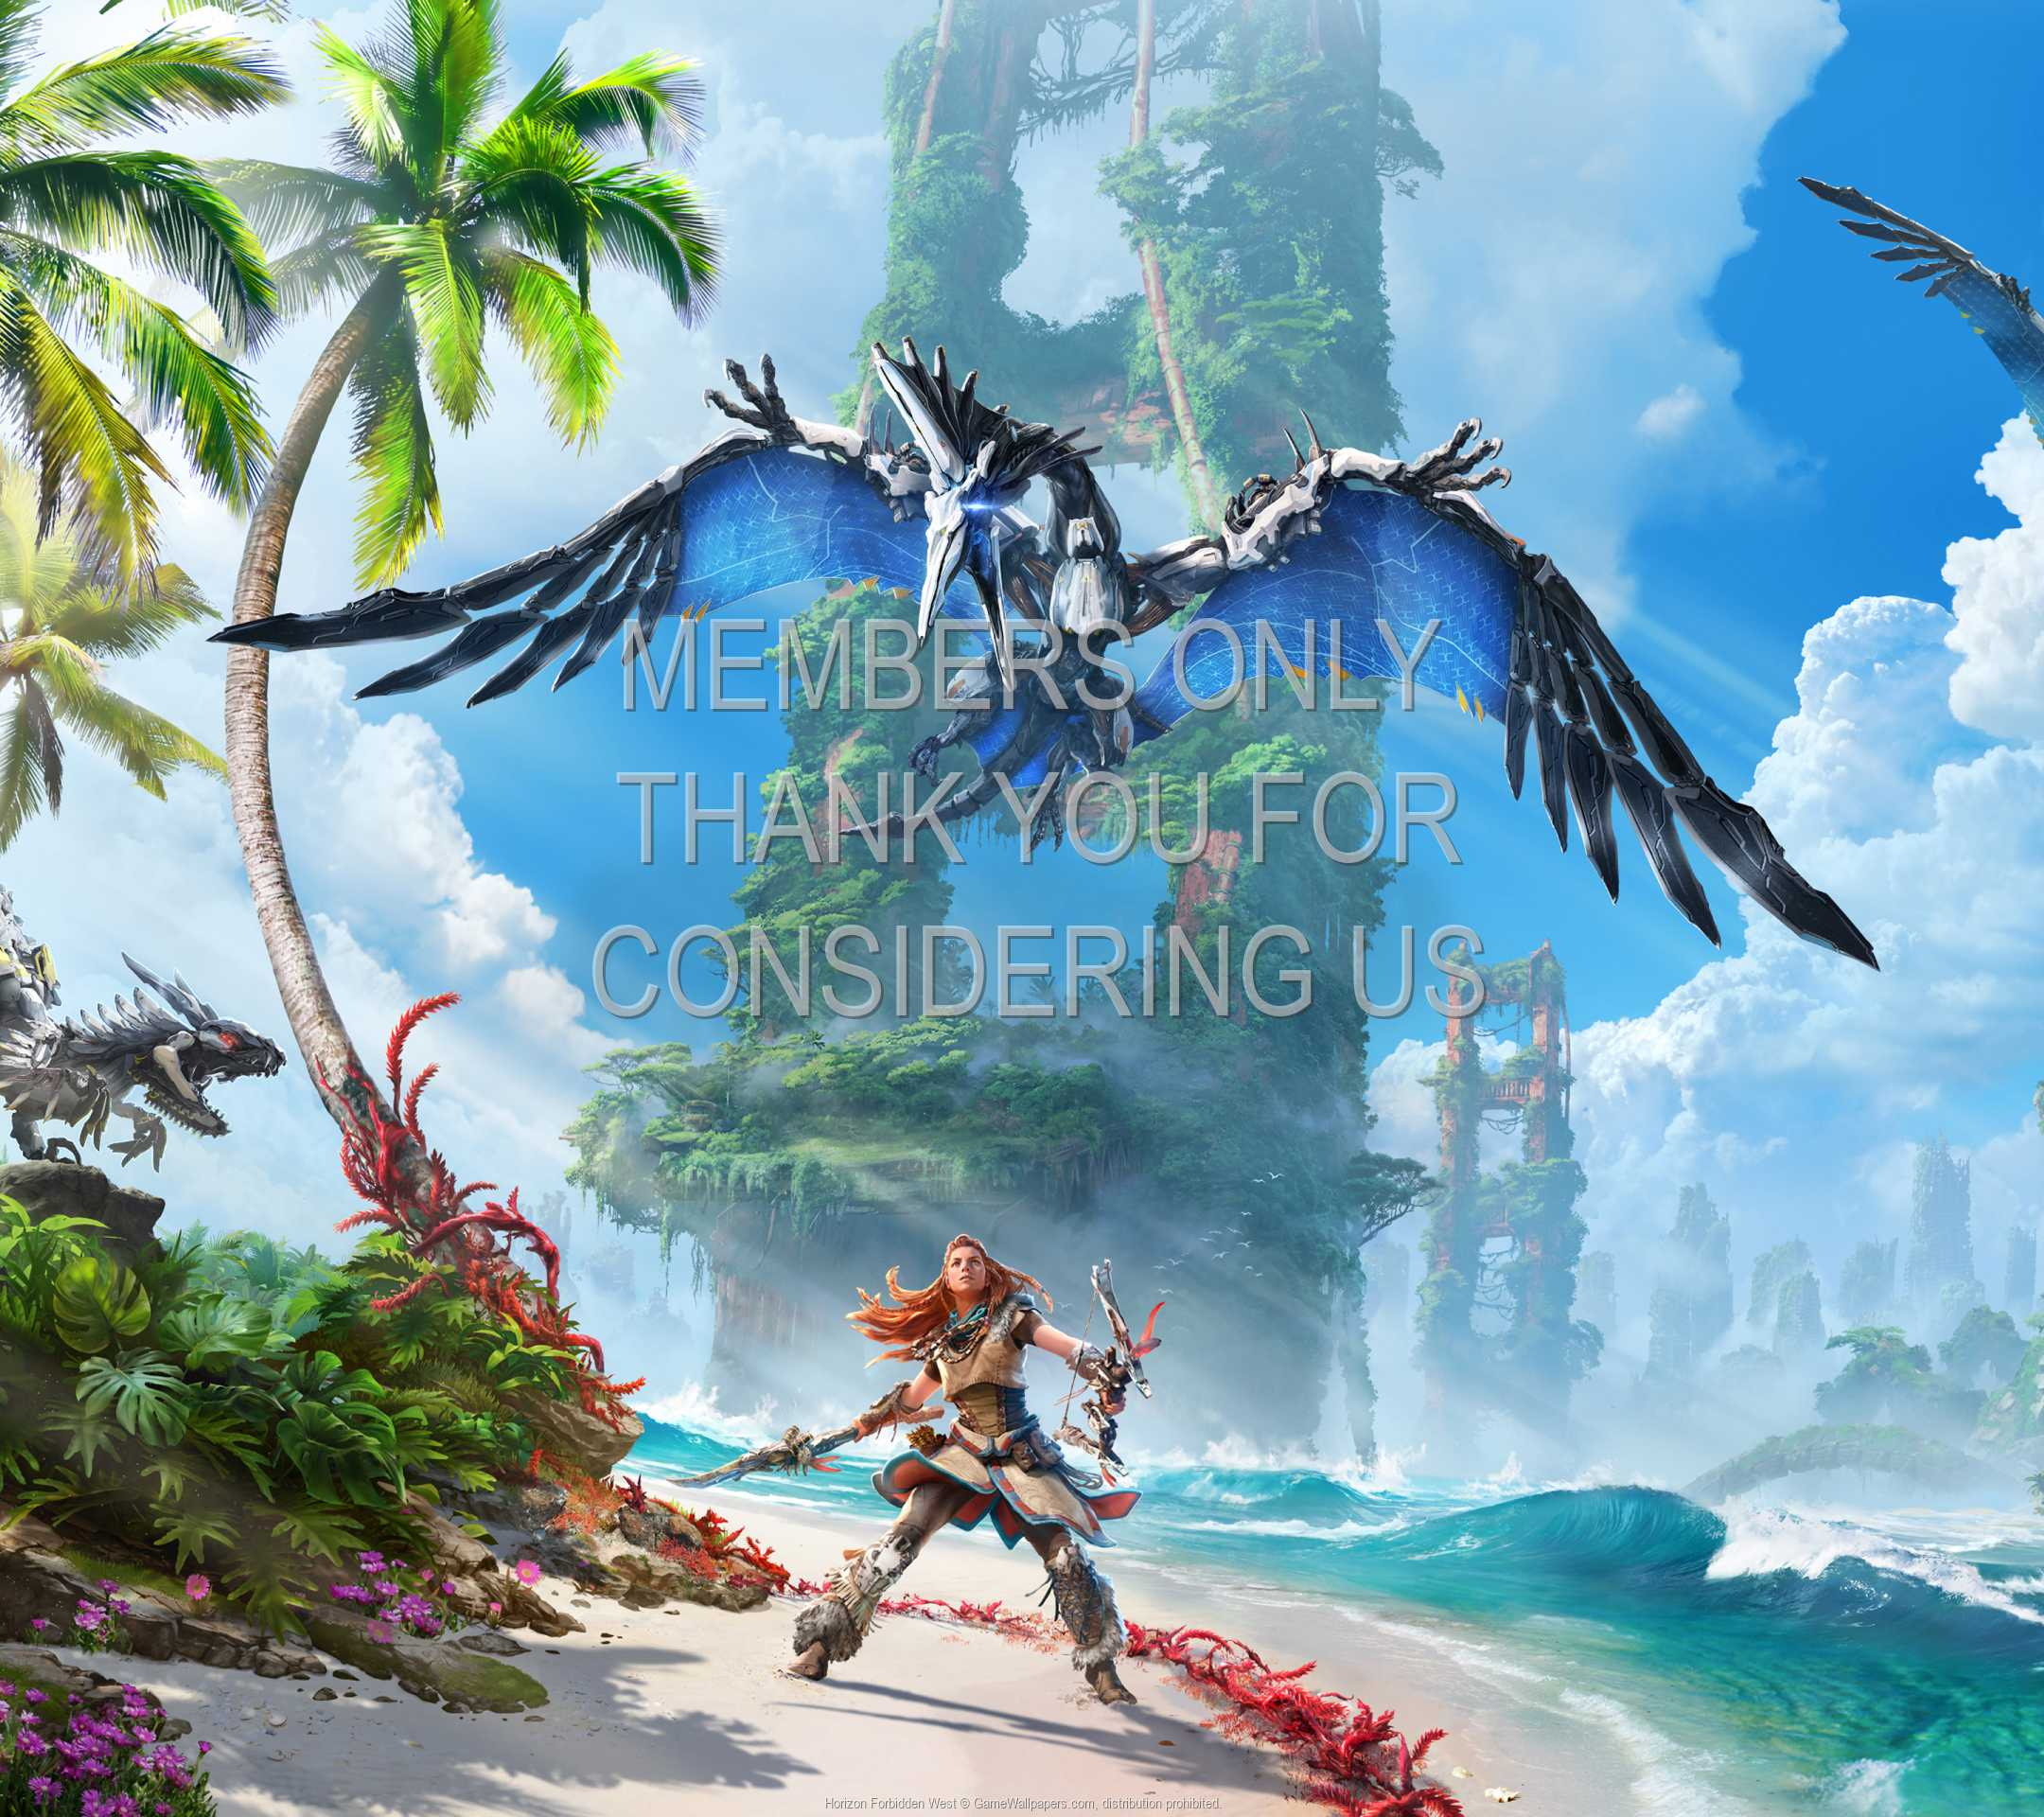 Horizon: Forbidden West 1080p Horizontal Handy Hintergrundbild 01